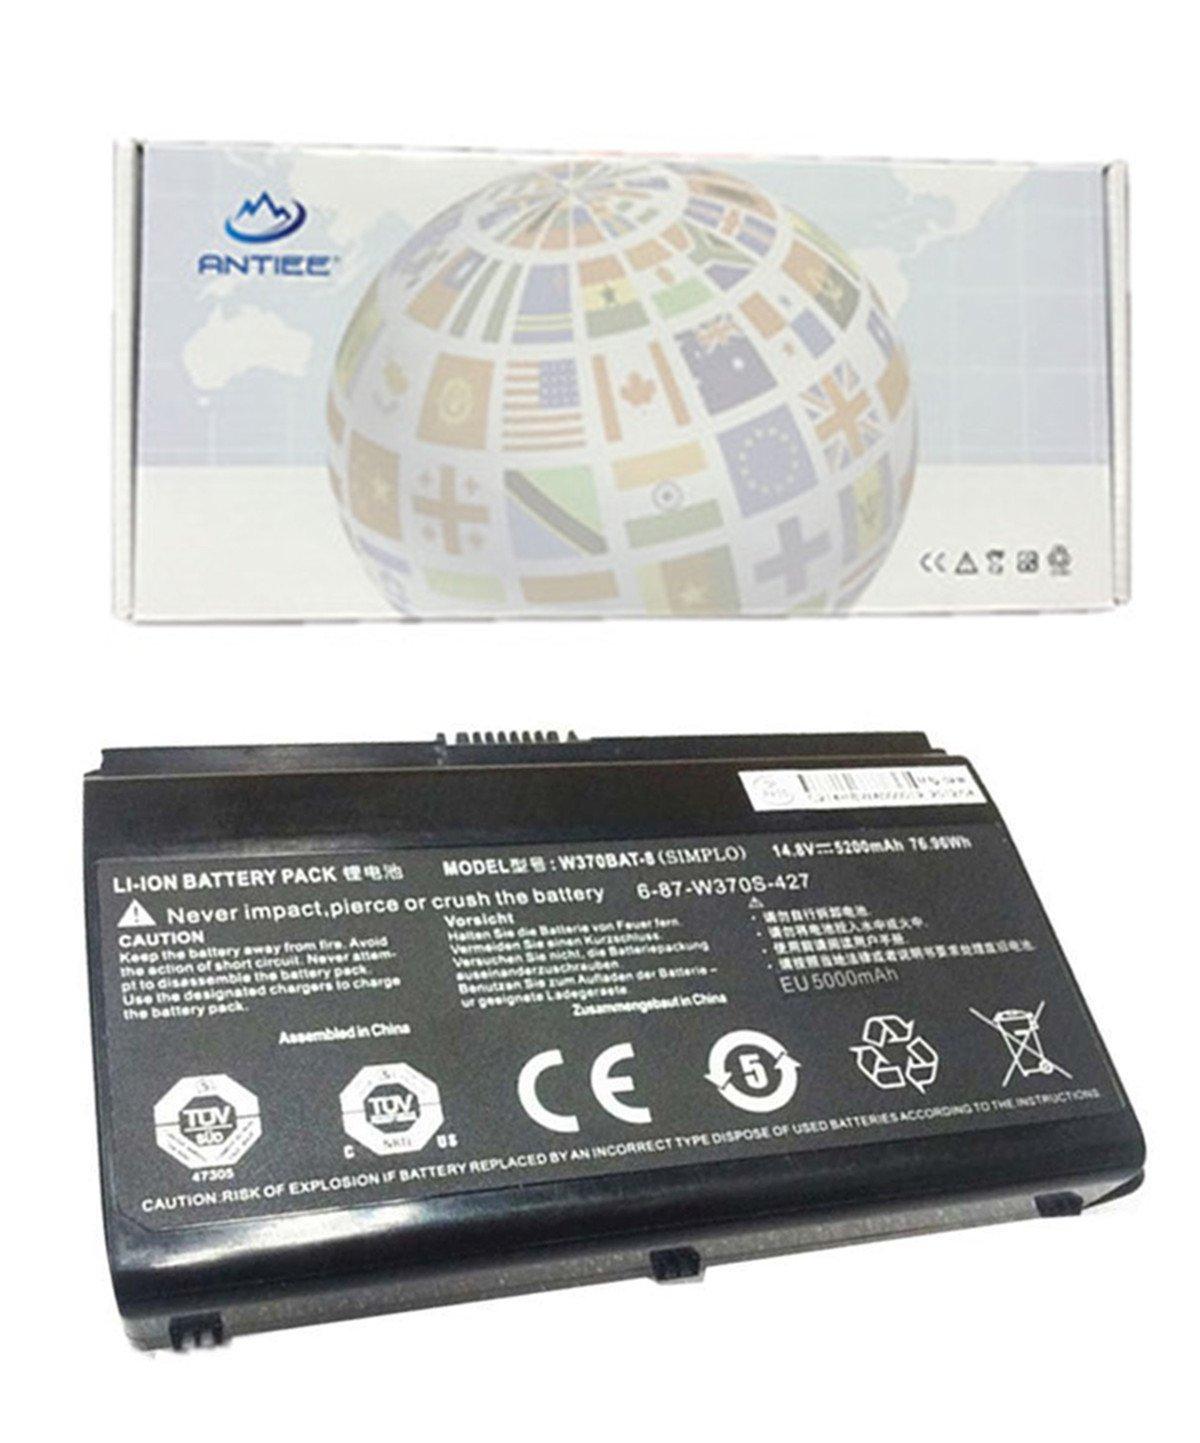 ANTIEE W370BAT-8 Battery for Clevo 6-87-W370S-427 6-87-W37ES-427 W350ET W350ETQ W355STQ Sager NP6350 NP6370 76.96Wh 5200mAh Series Notebook